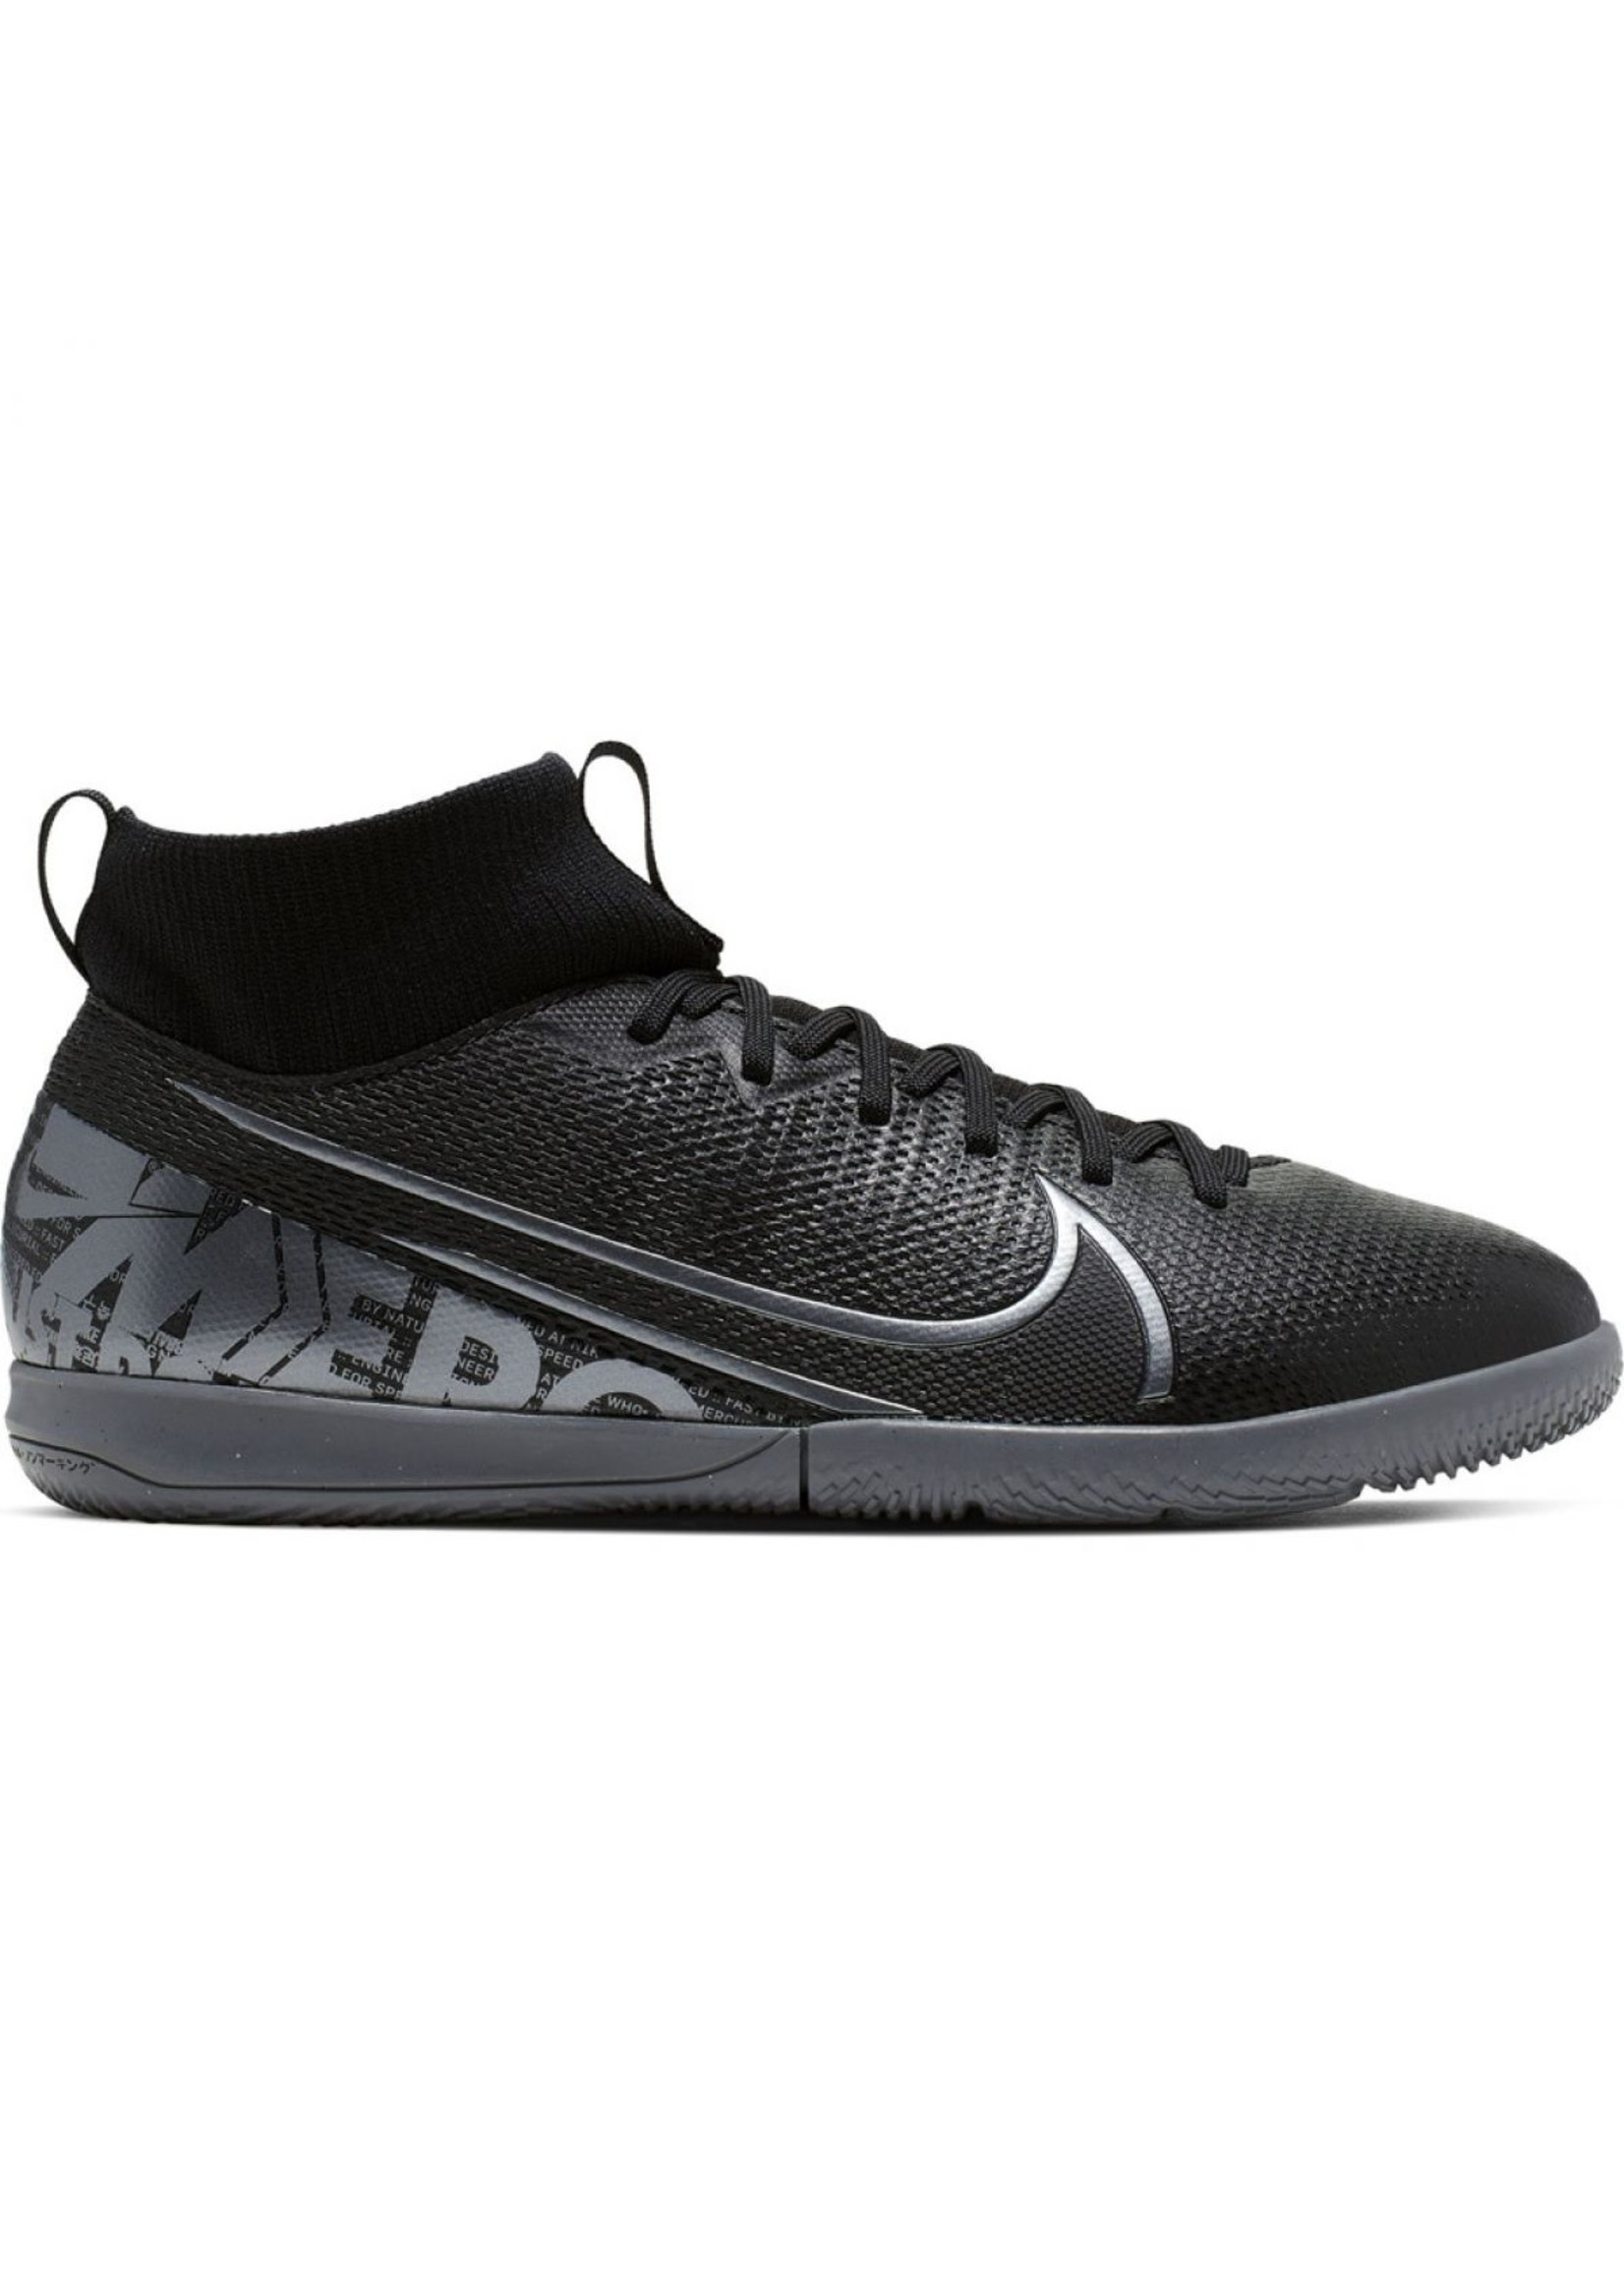 Nike Jr Superfly 7 Academy IC - Black/Grey